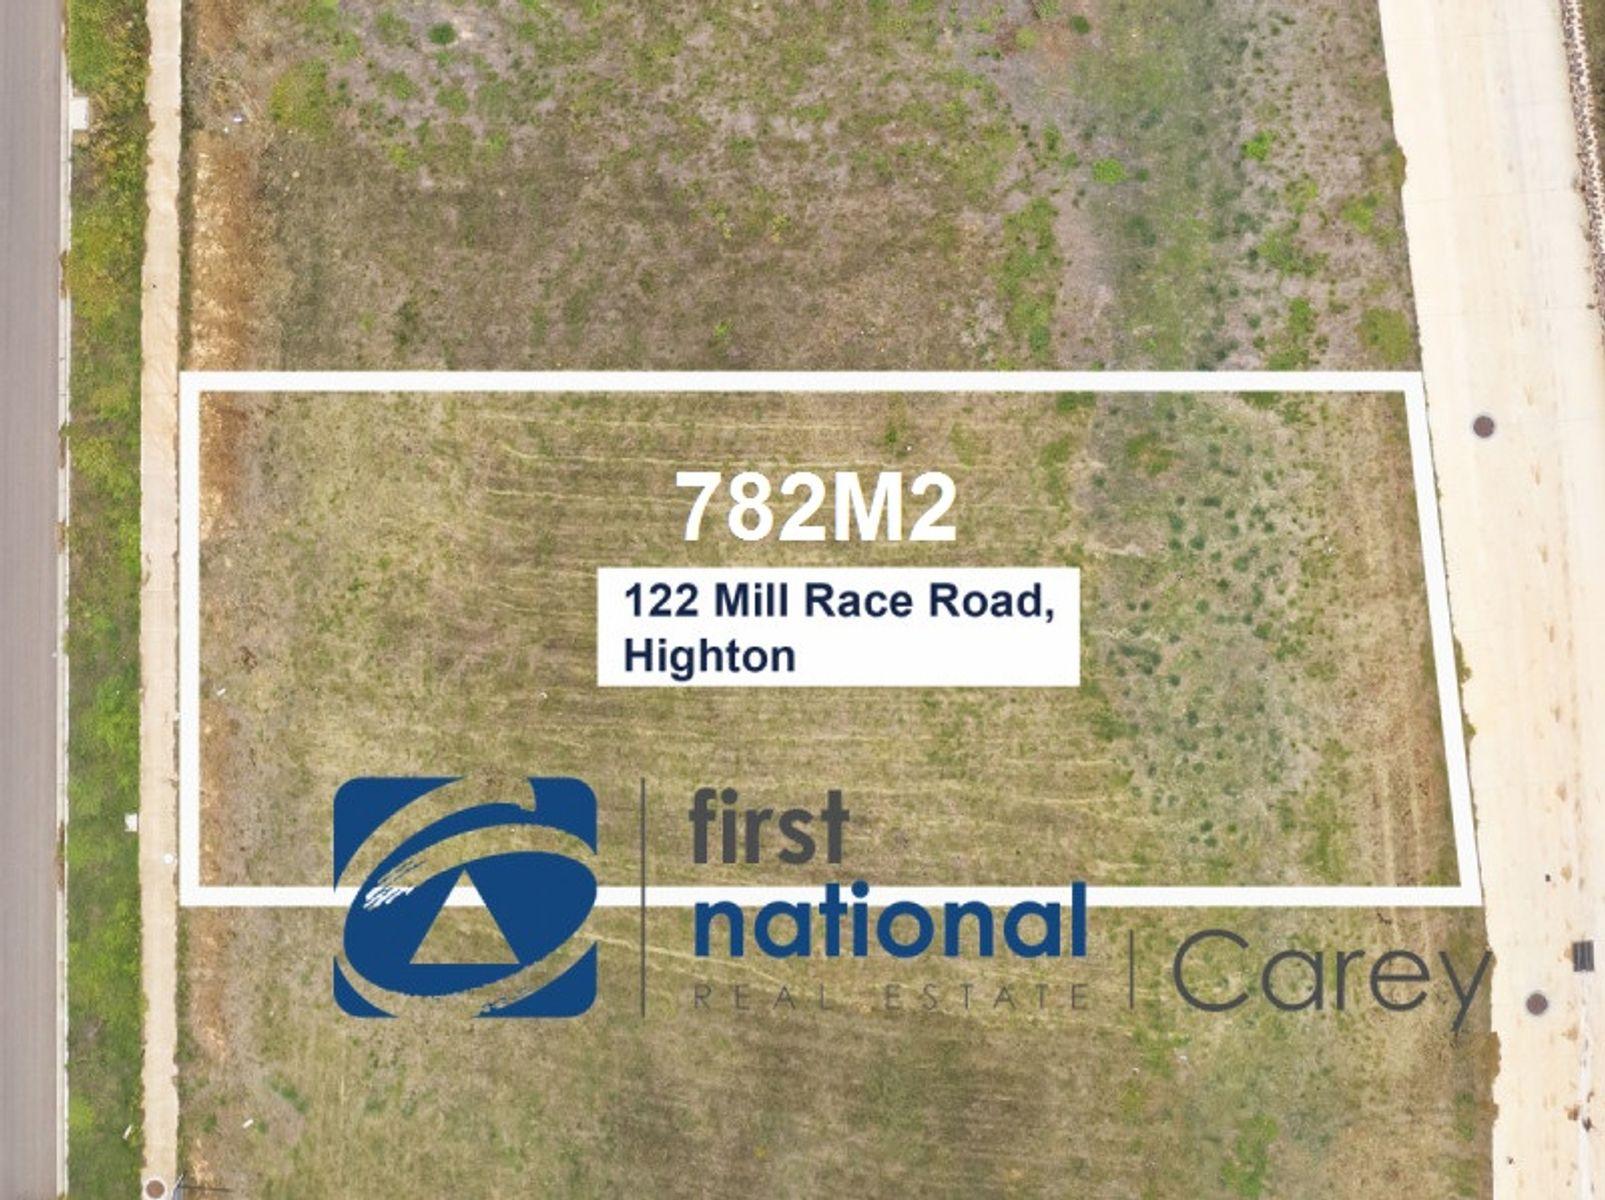 122 Mill Race Road, Highton, VIC 3216